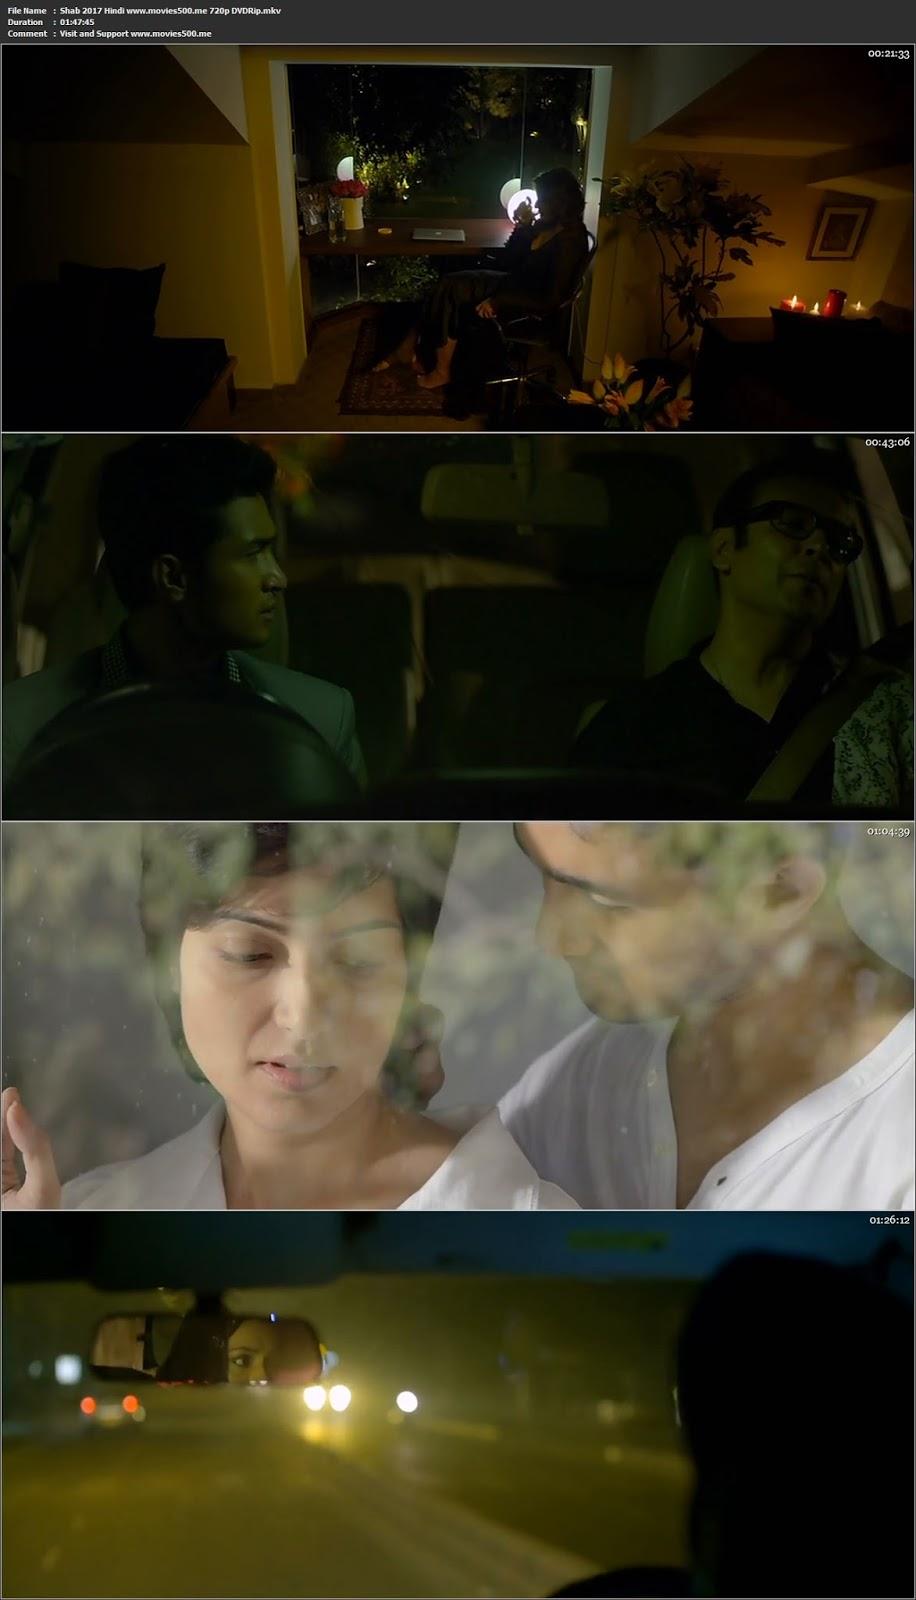 Shab 2017 Hindi Full Movie 800MB DVDRip 720p at createkits.com